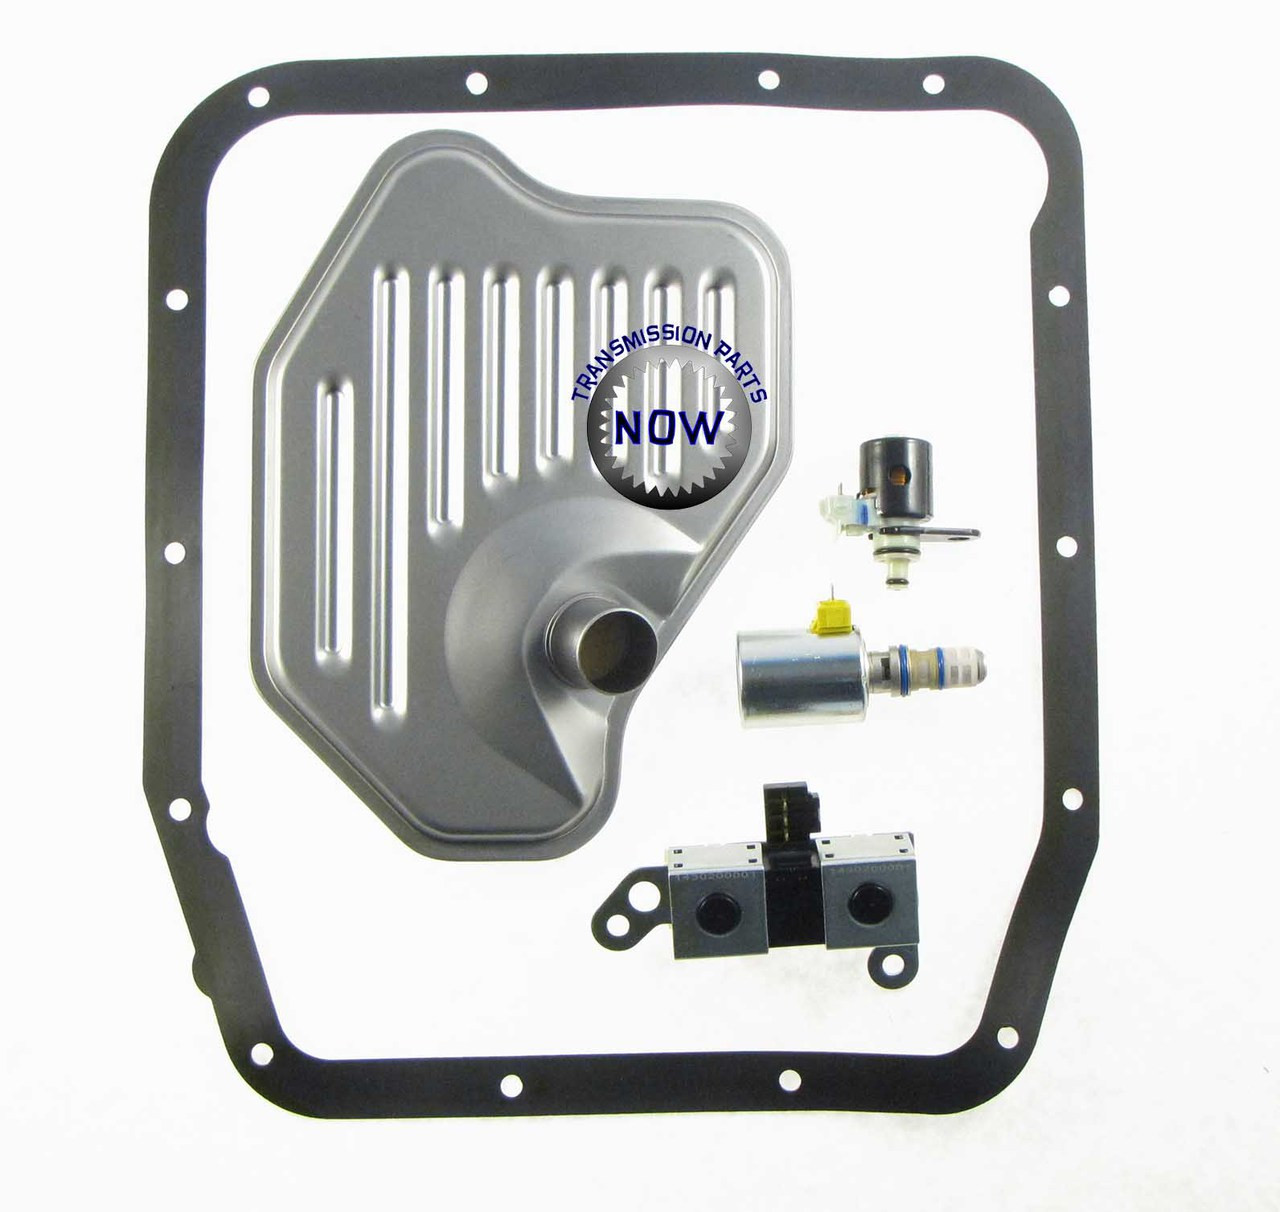 AODE 4R70 shift solenoid, TCC solenoid, Lock-up Solenoid, EPC solenoid, Pressure control solenoid, Filter kit